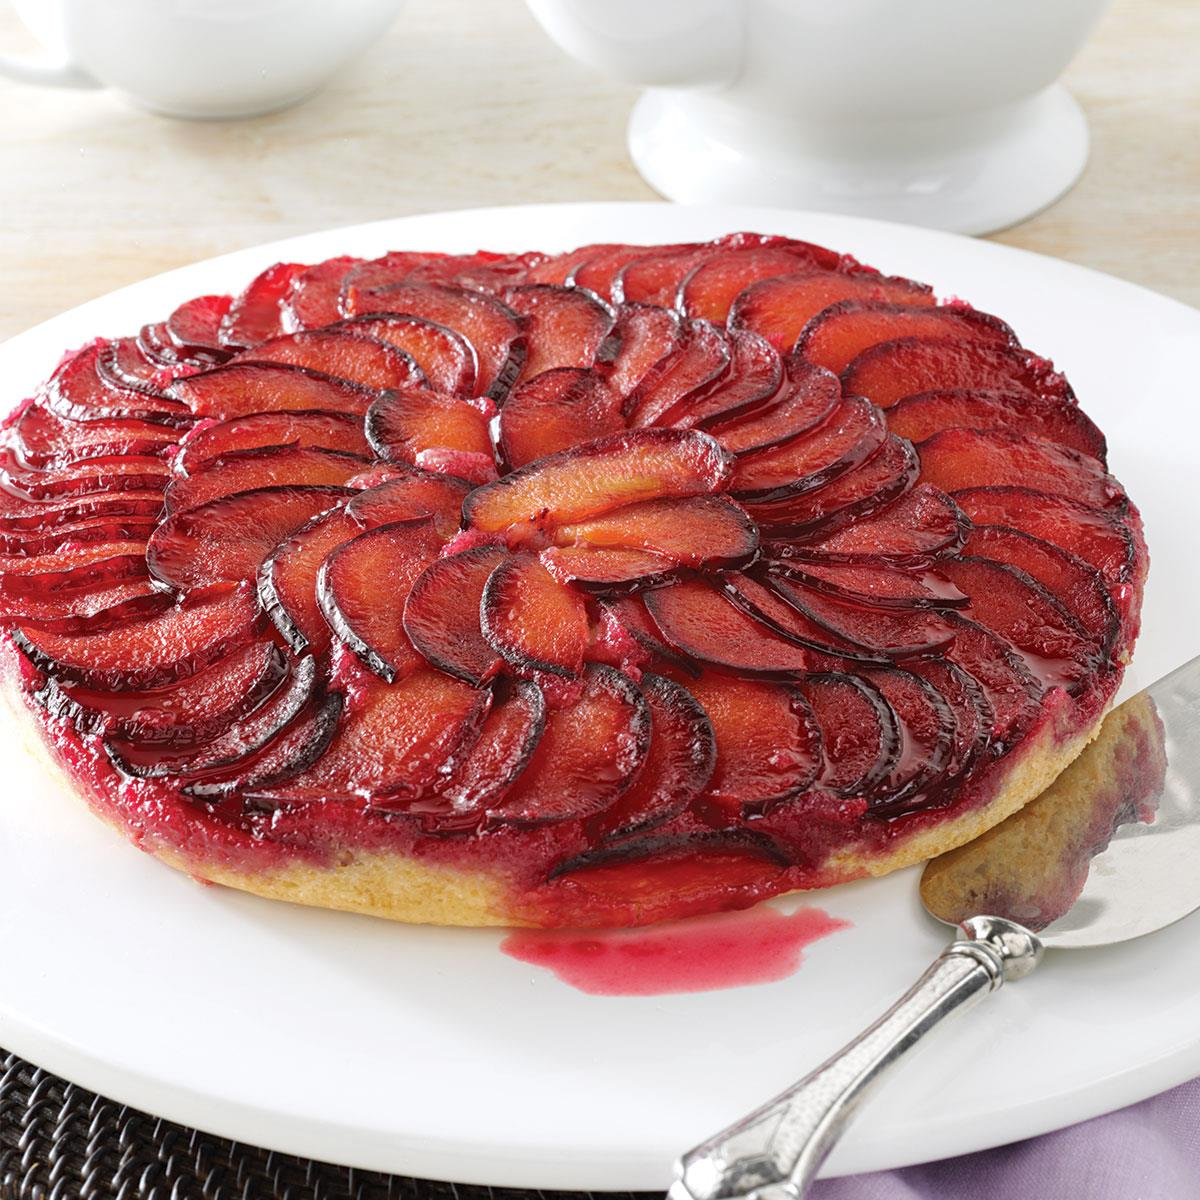 Recipe Of Plum Upside Down Cake